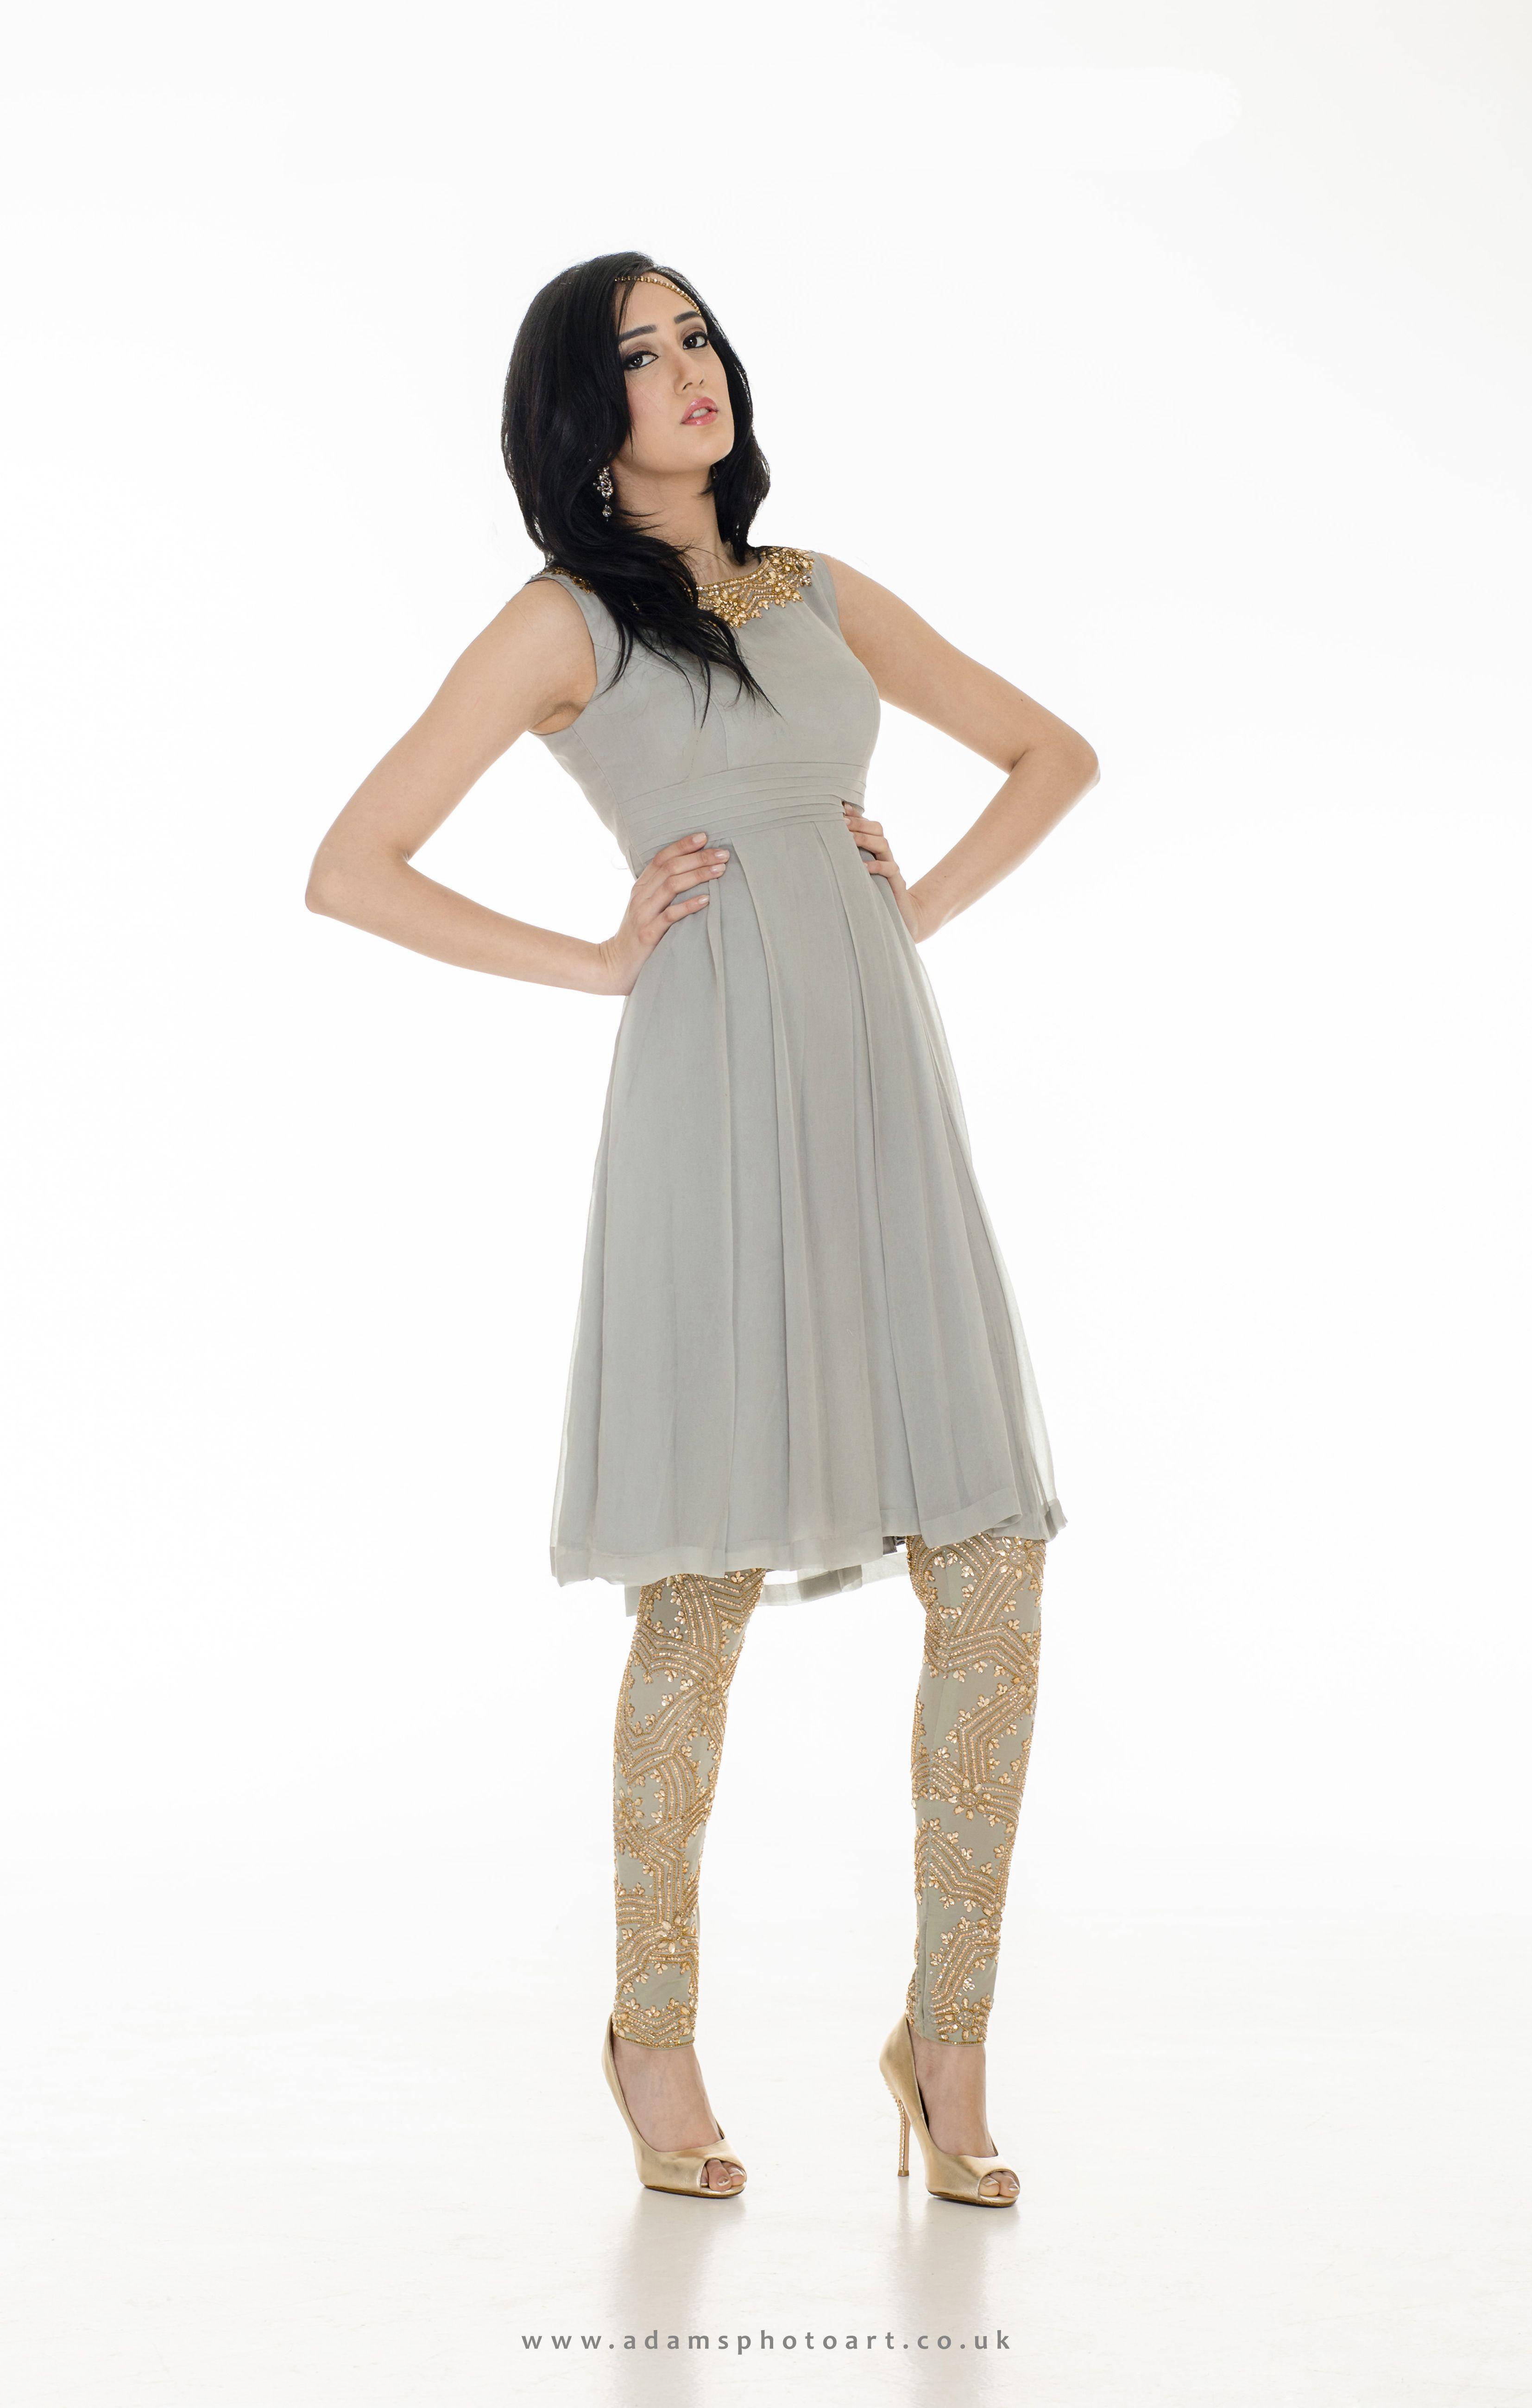 9cd76001b1ca8 Punjabi suit - Chiffon dress and embellished leggings. | Puneet ...